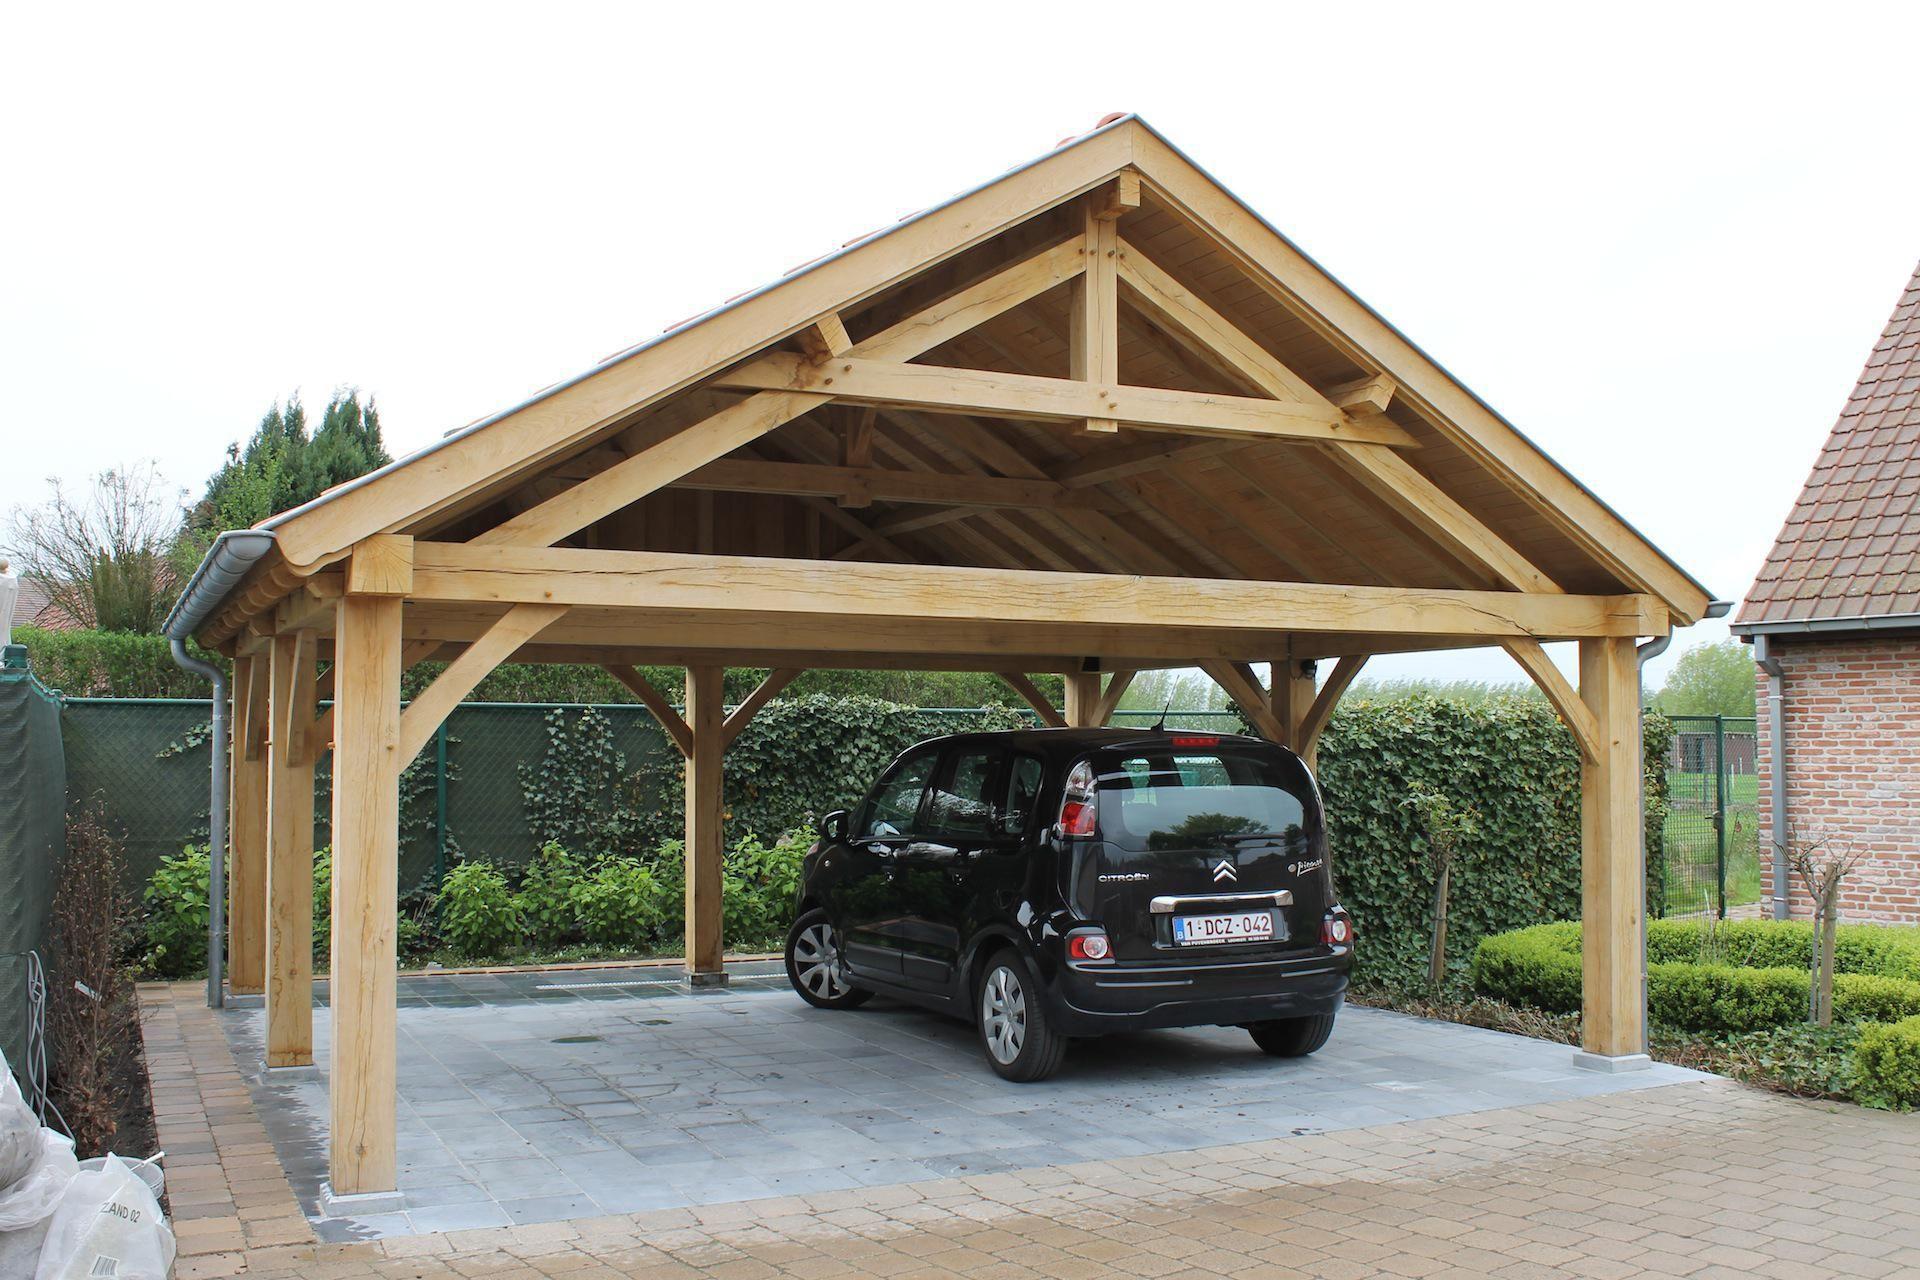 Wood Carport Designs : Best Carports Ideas - New Home ...